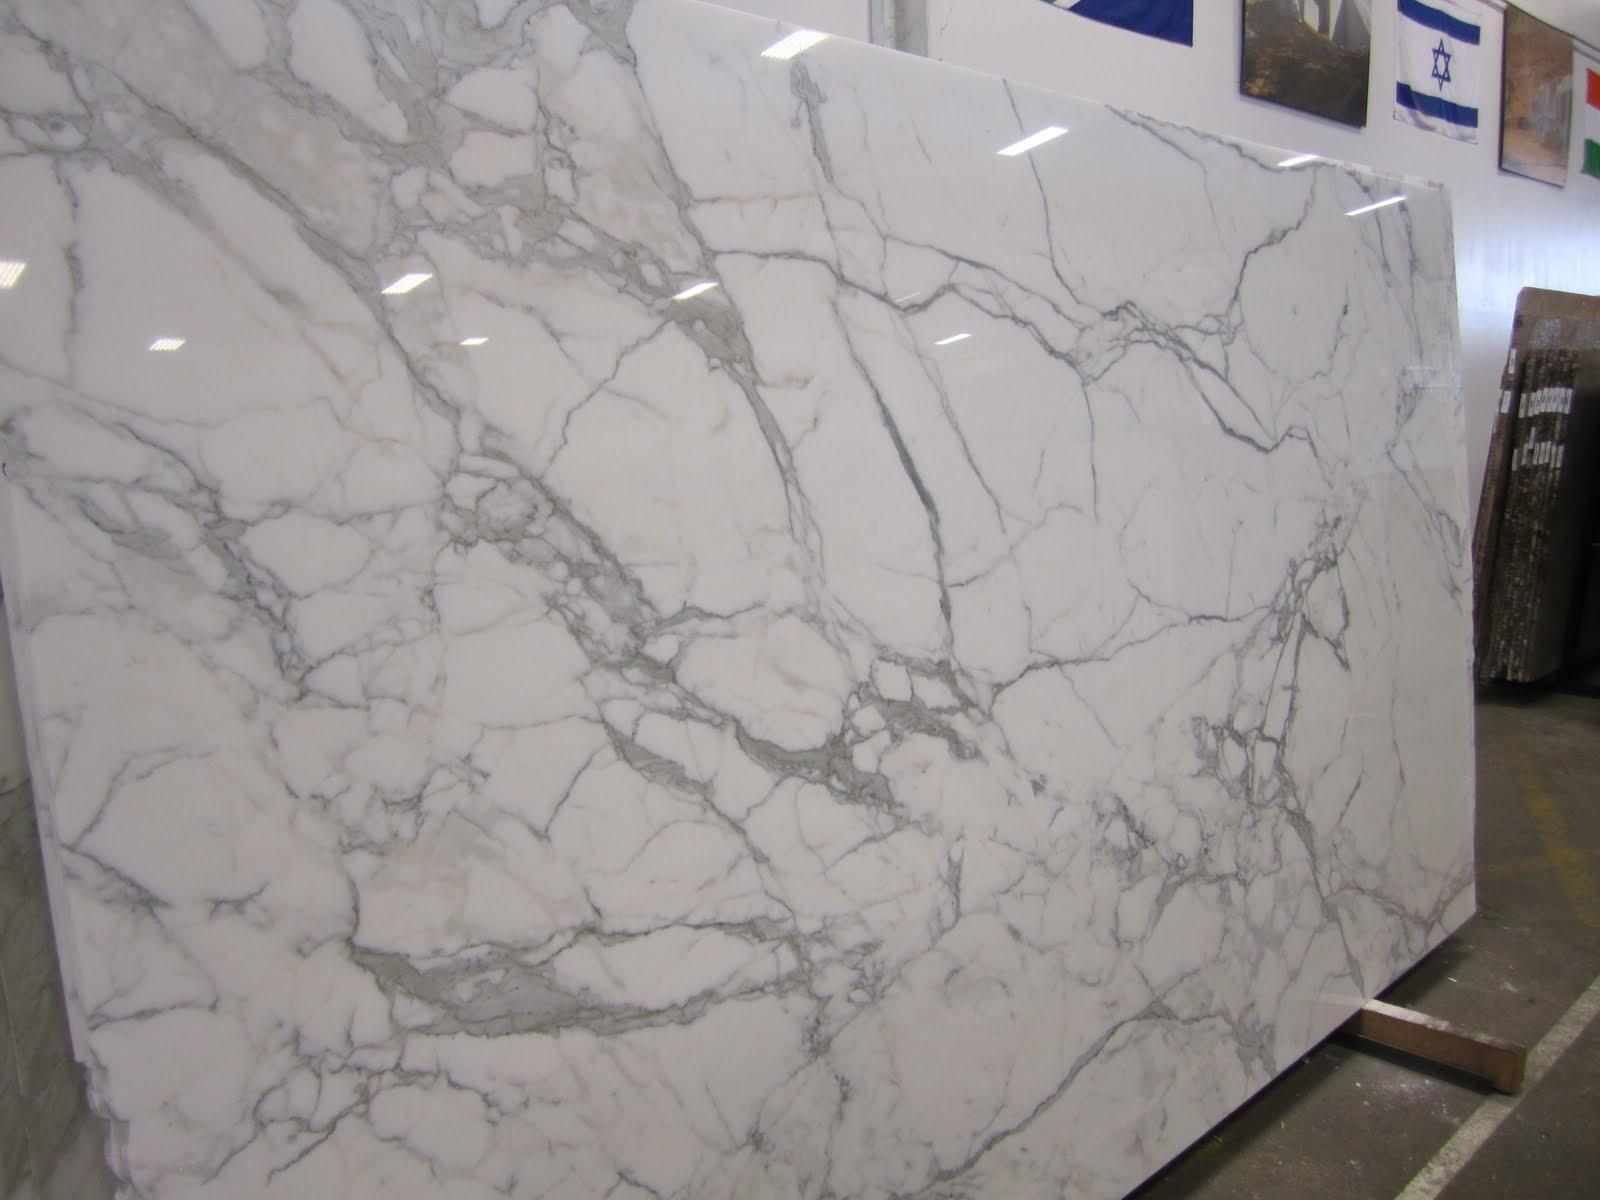 Usc Granite Calacatta Gold 120 X 69 118 X 69 121 X 70